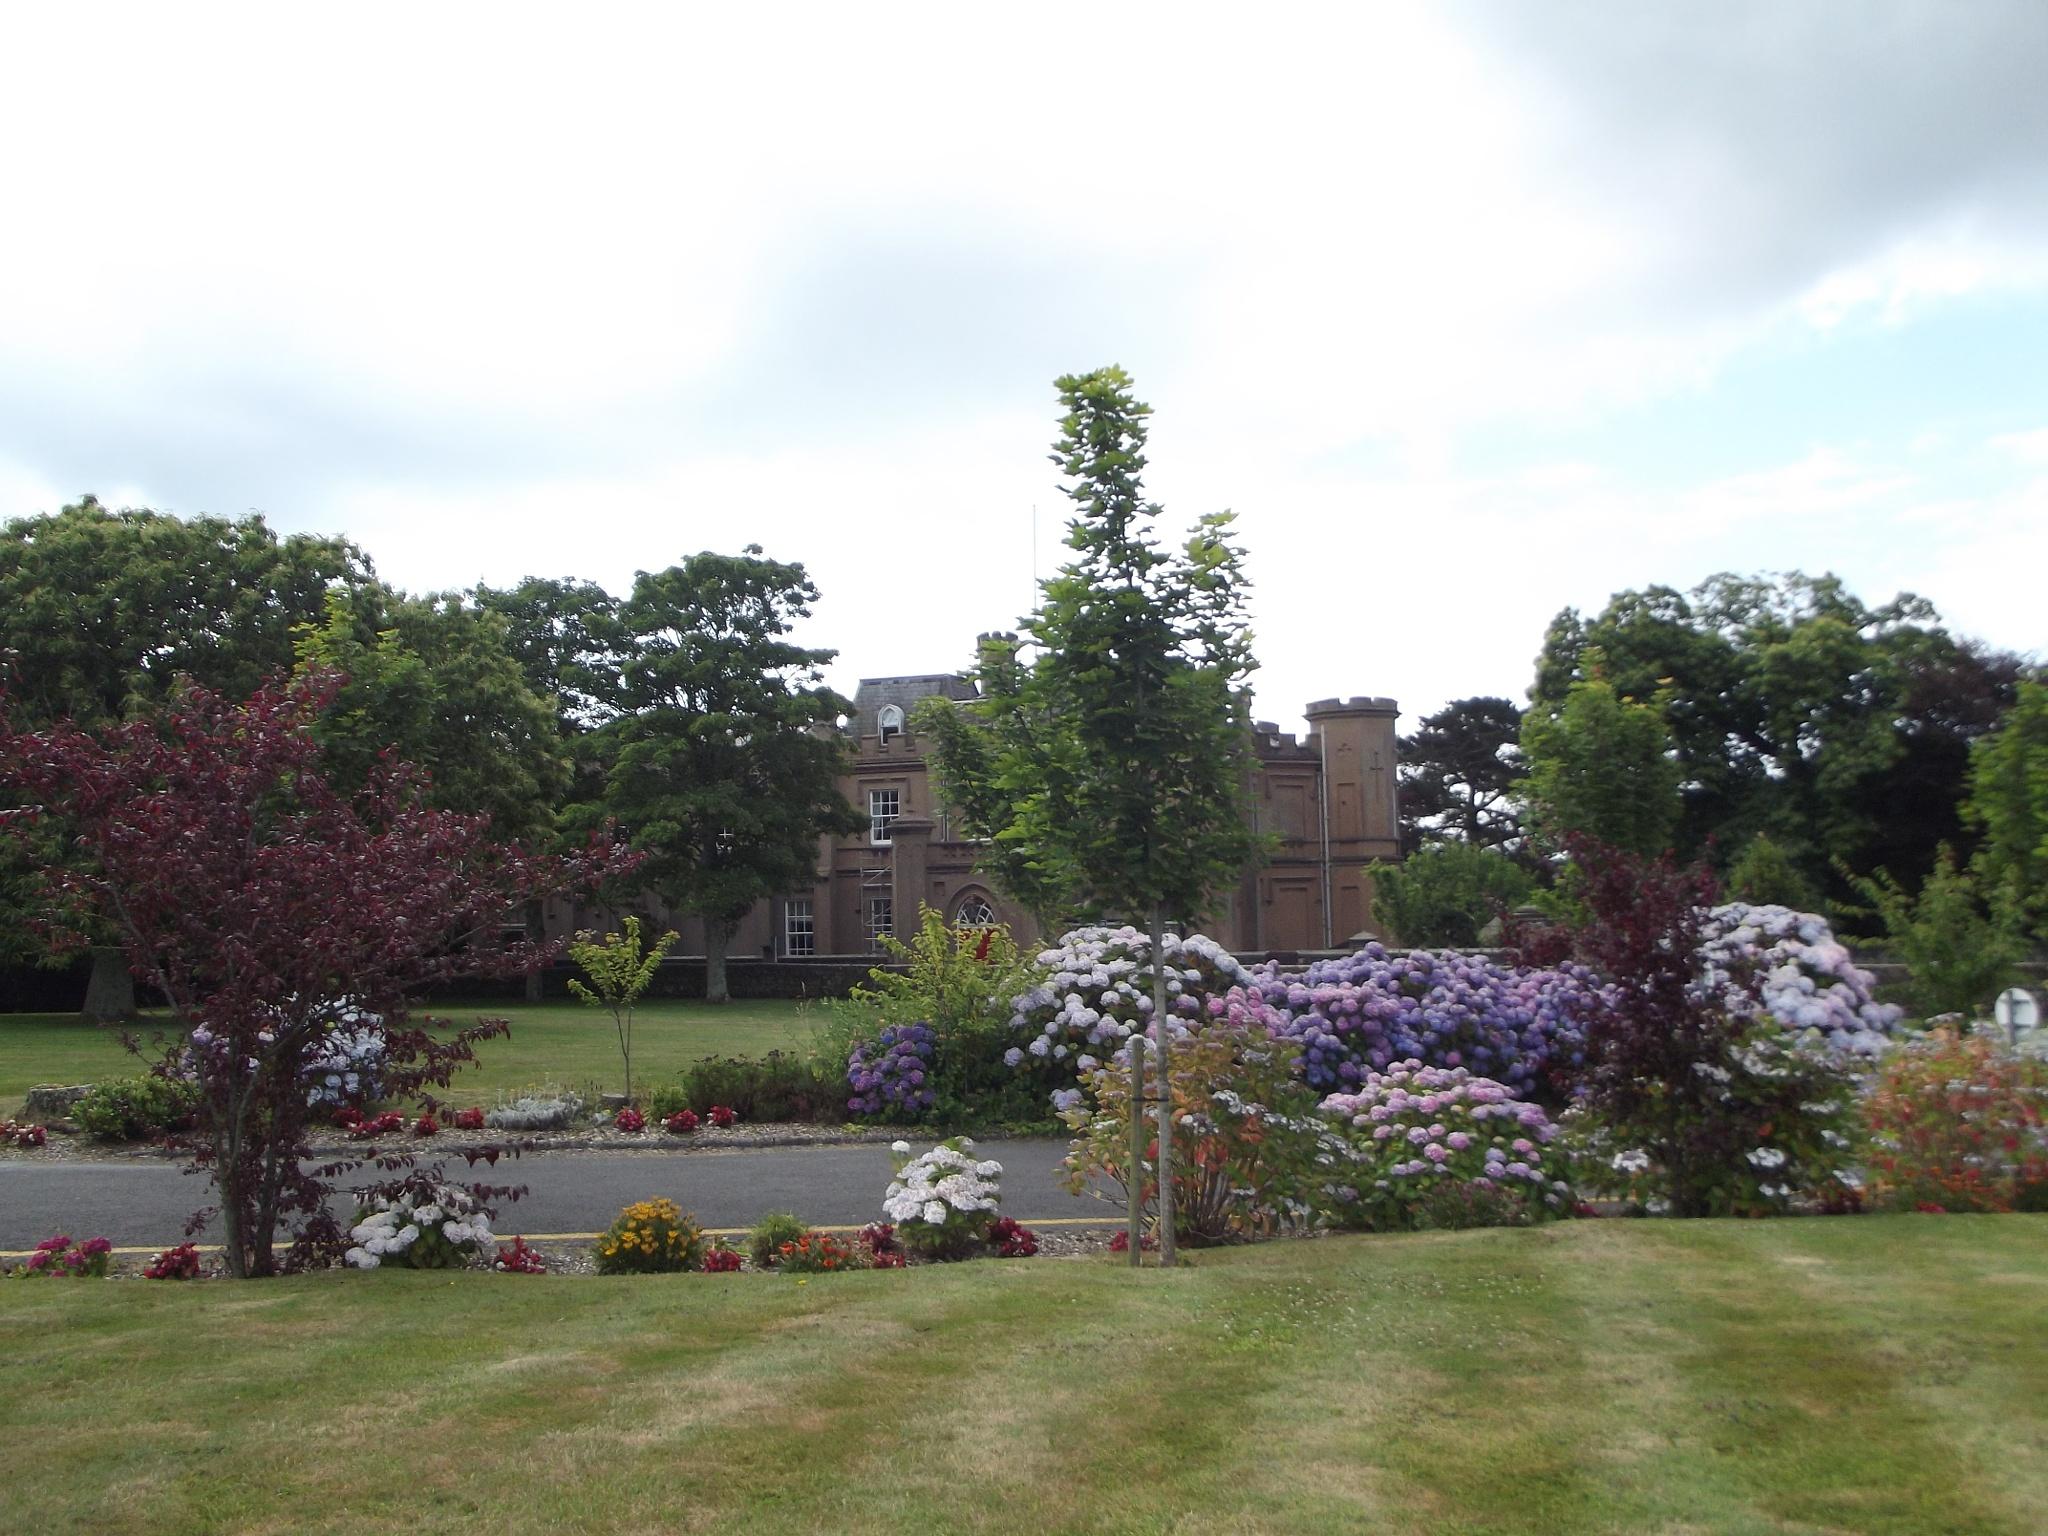 Garden in Guernsey by james.charles.58511